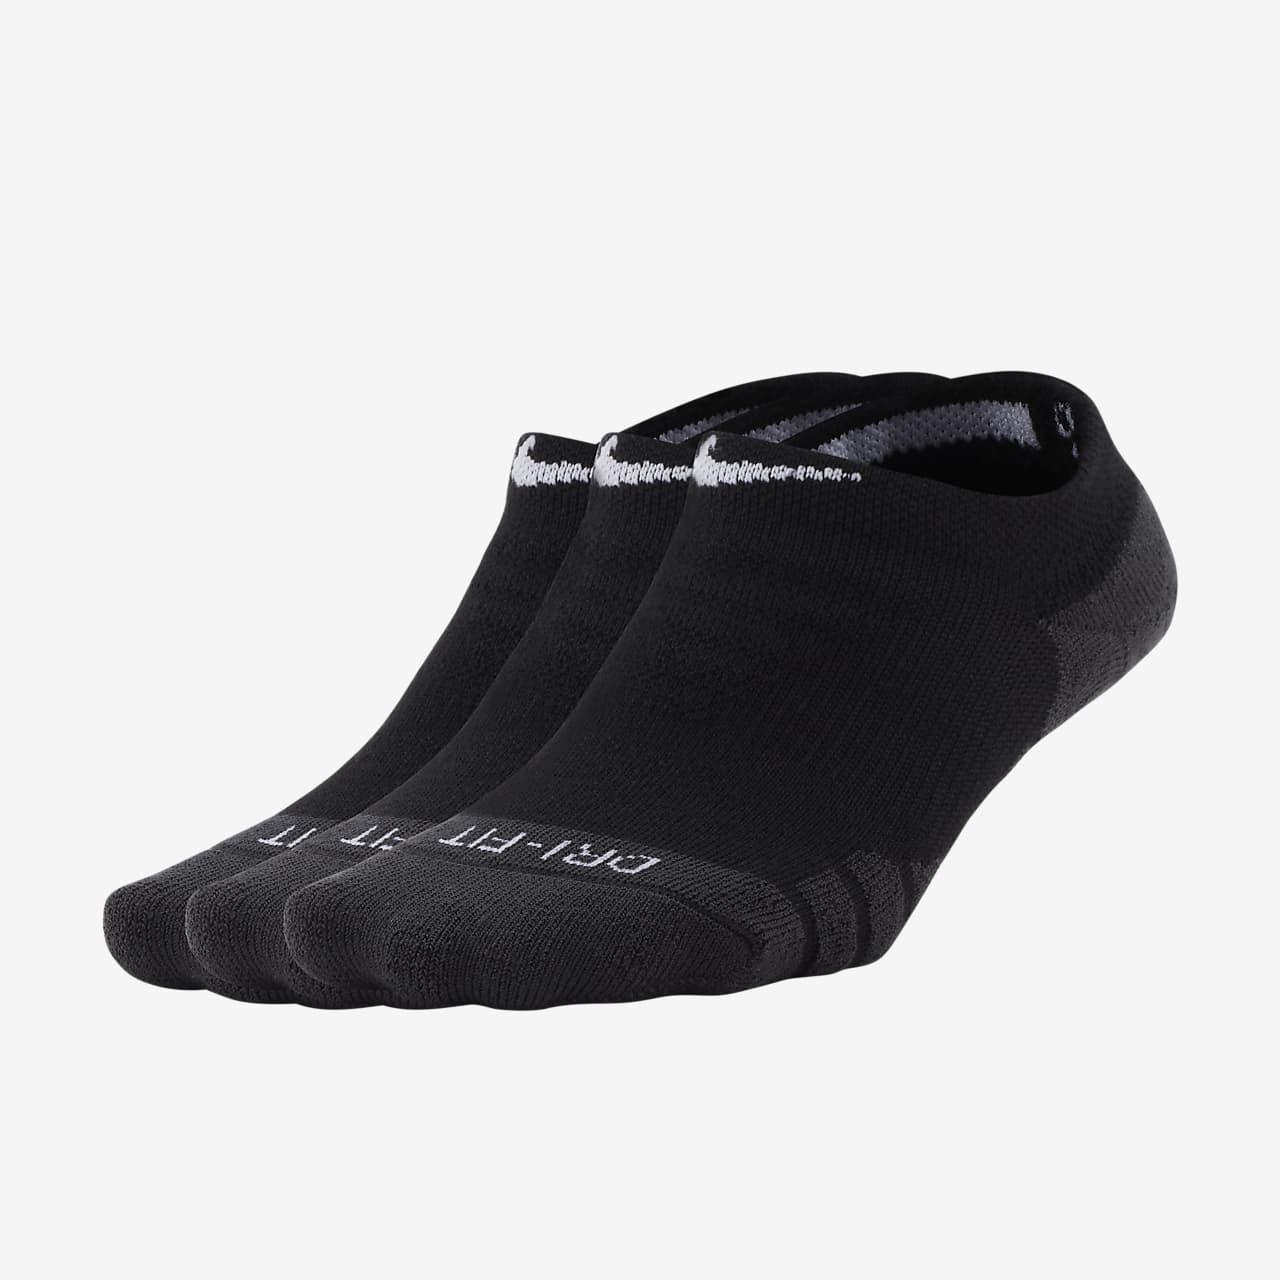 Nike Sports Socks No Show Ankle 3 Pair Athletic Sportswear Ladies Womens Mens